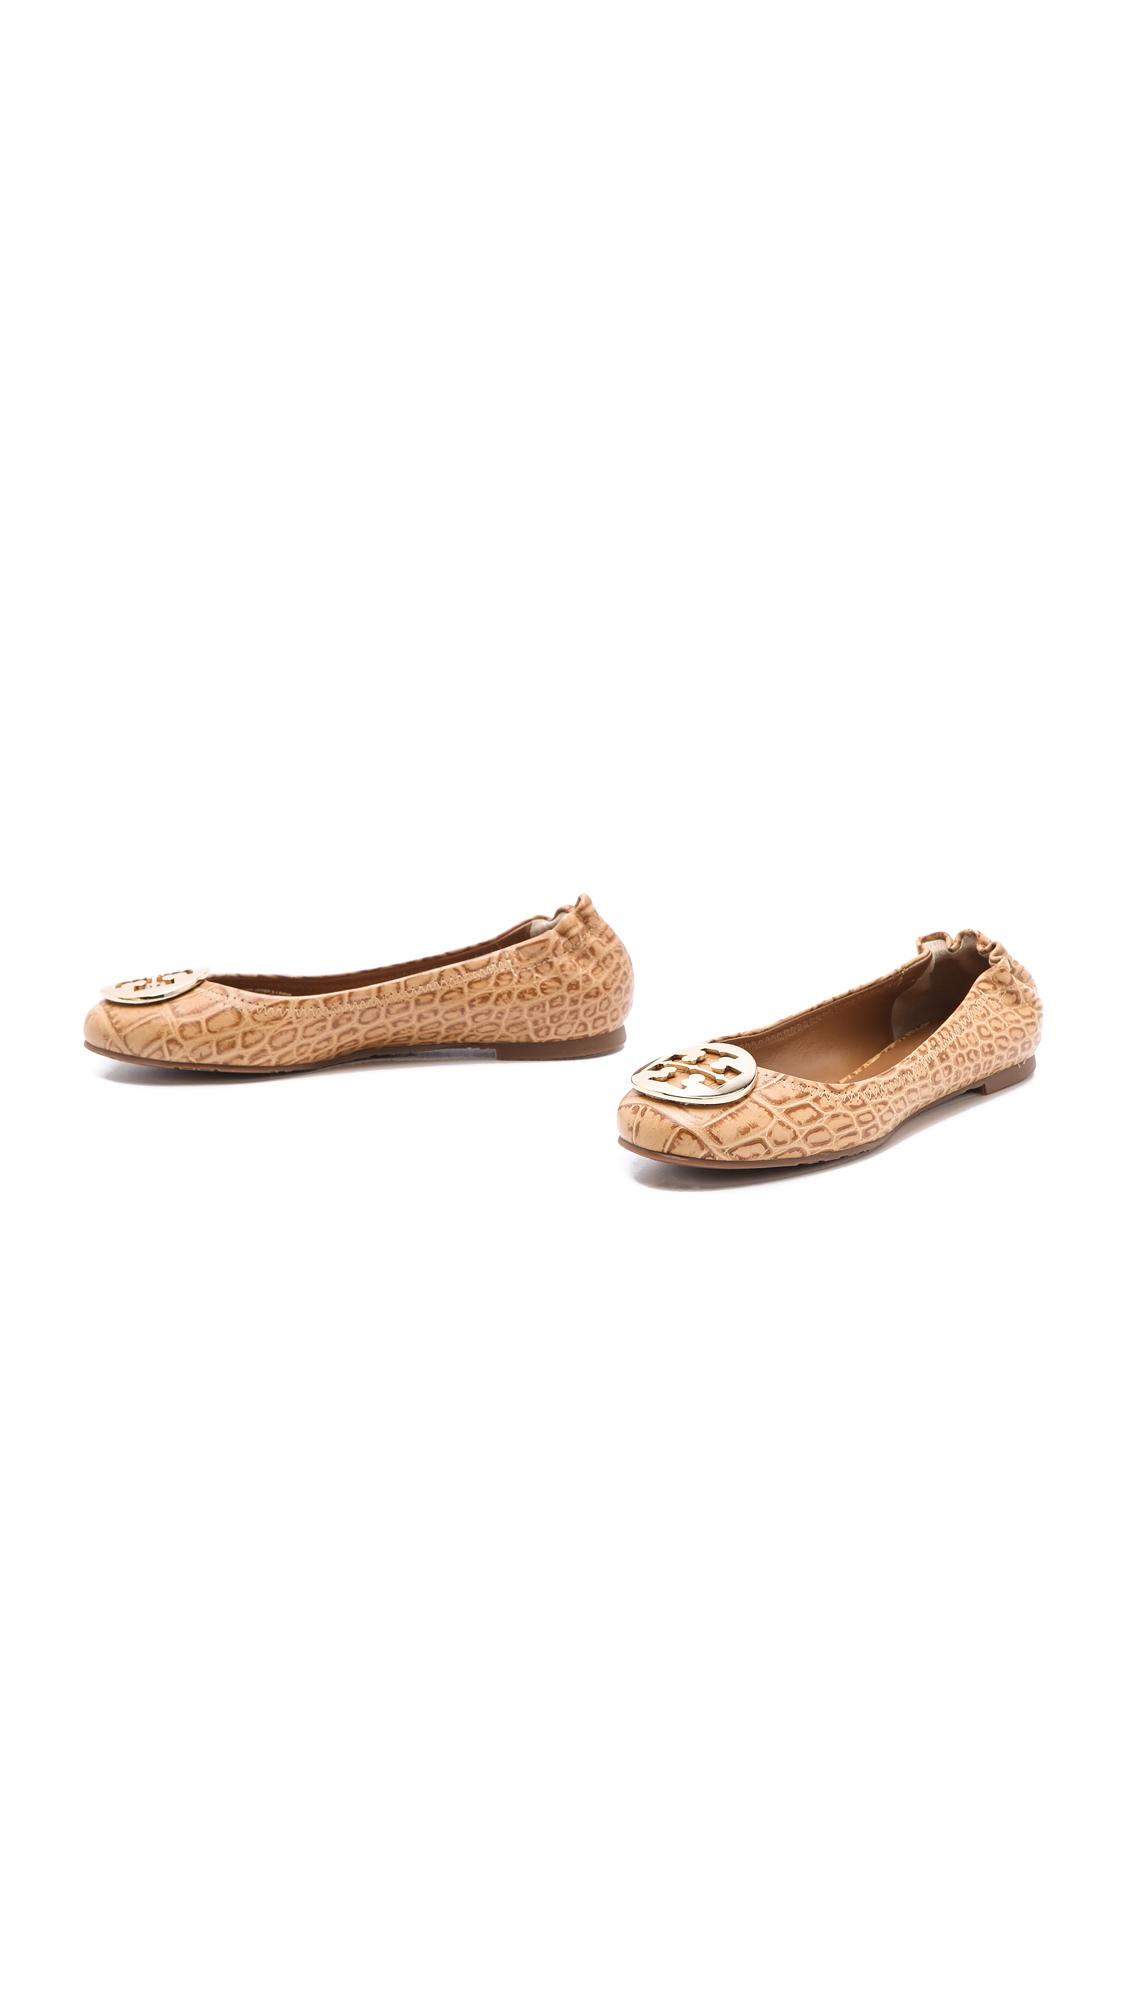 5478fdd655c9 Lyst - Tory Burch Reva Croc Ballet Flats in Natural